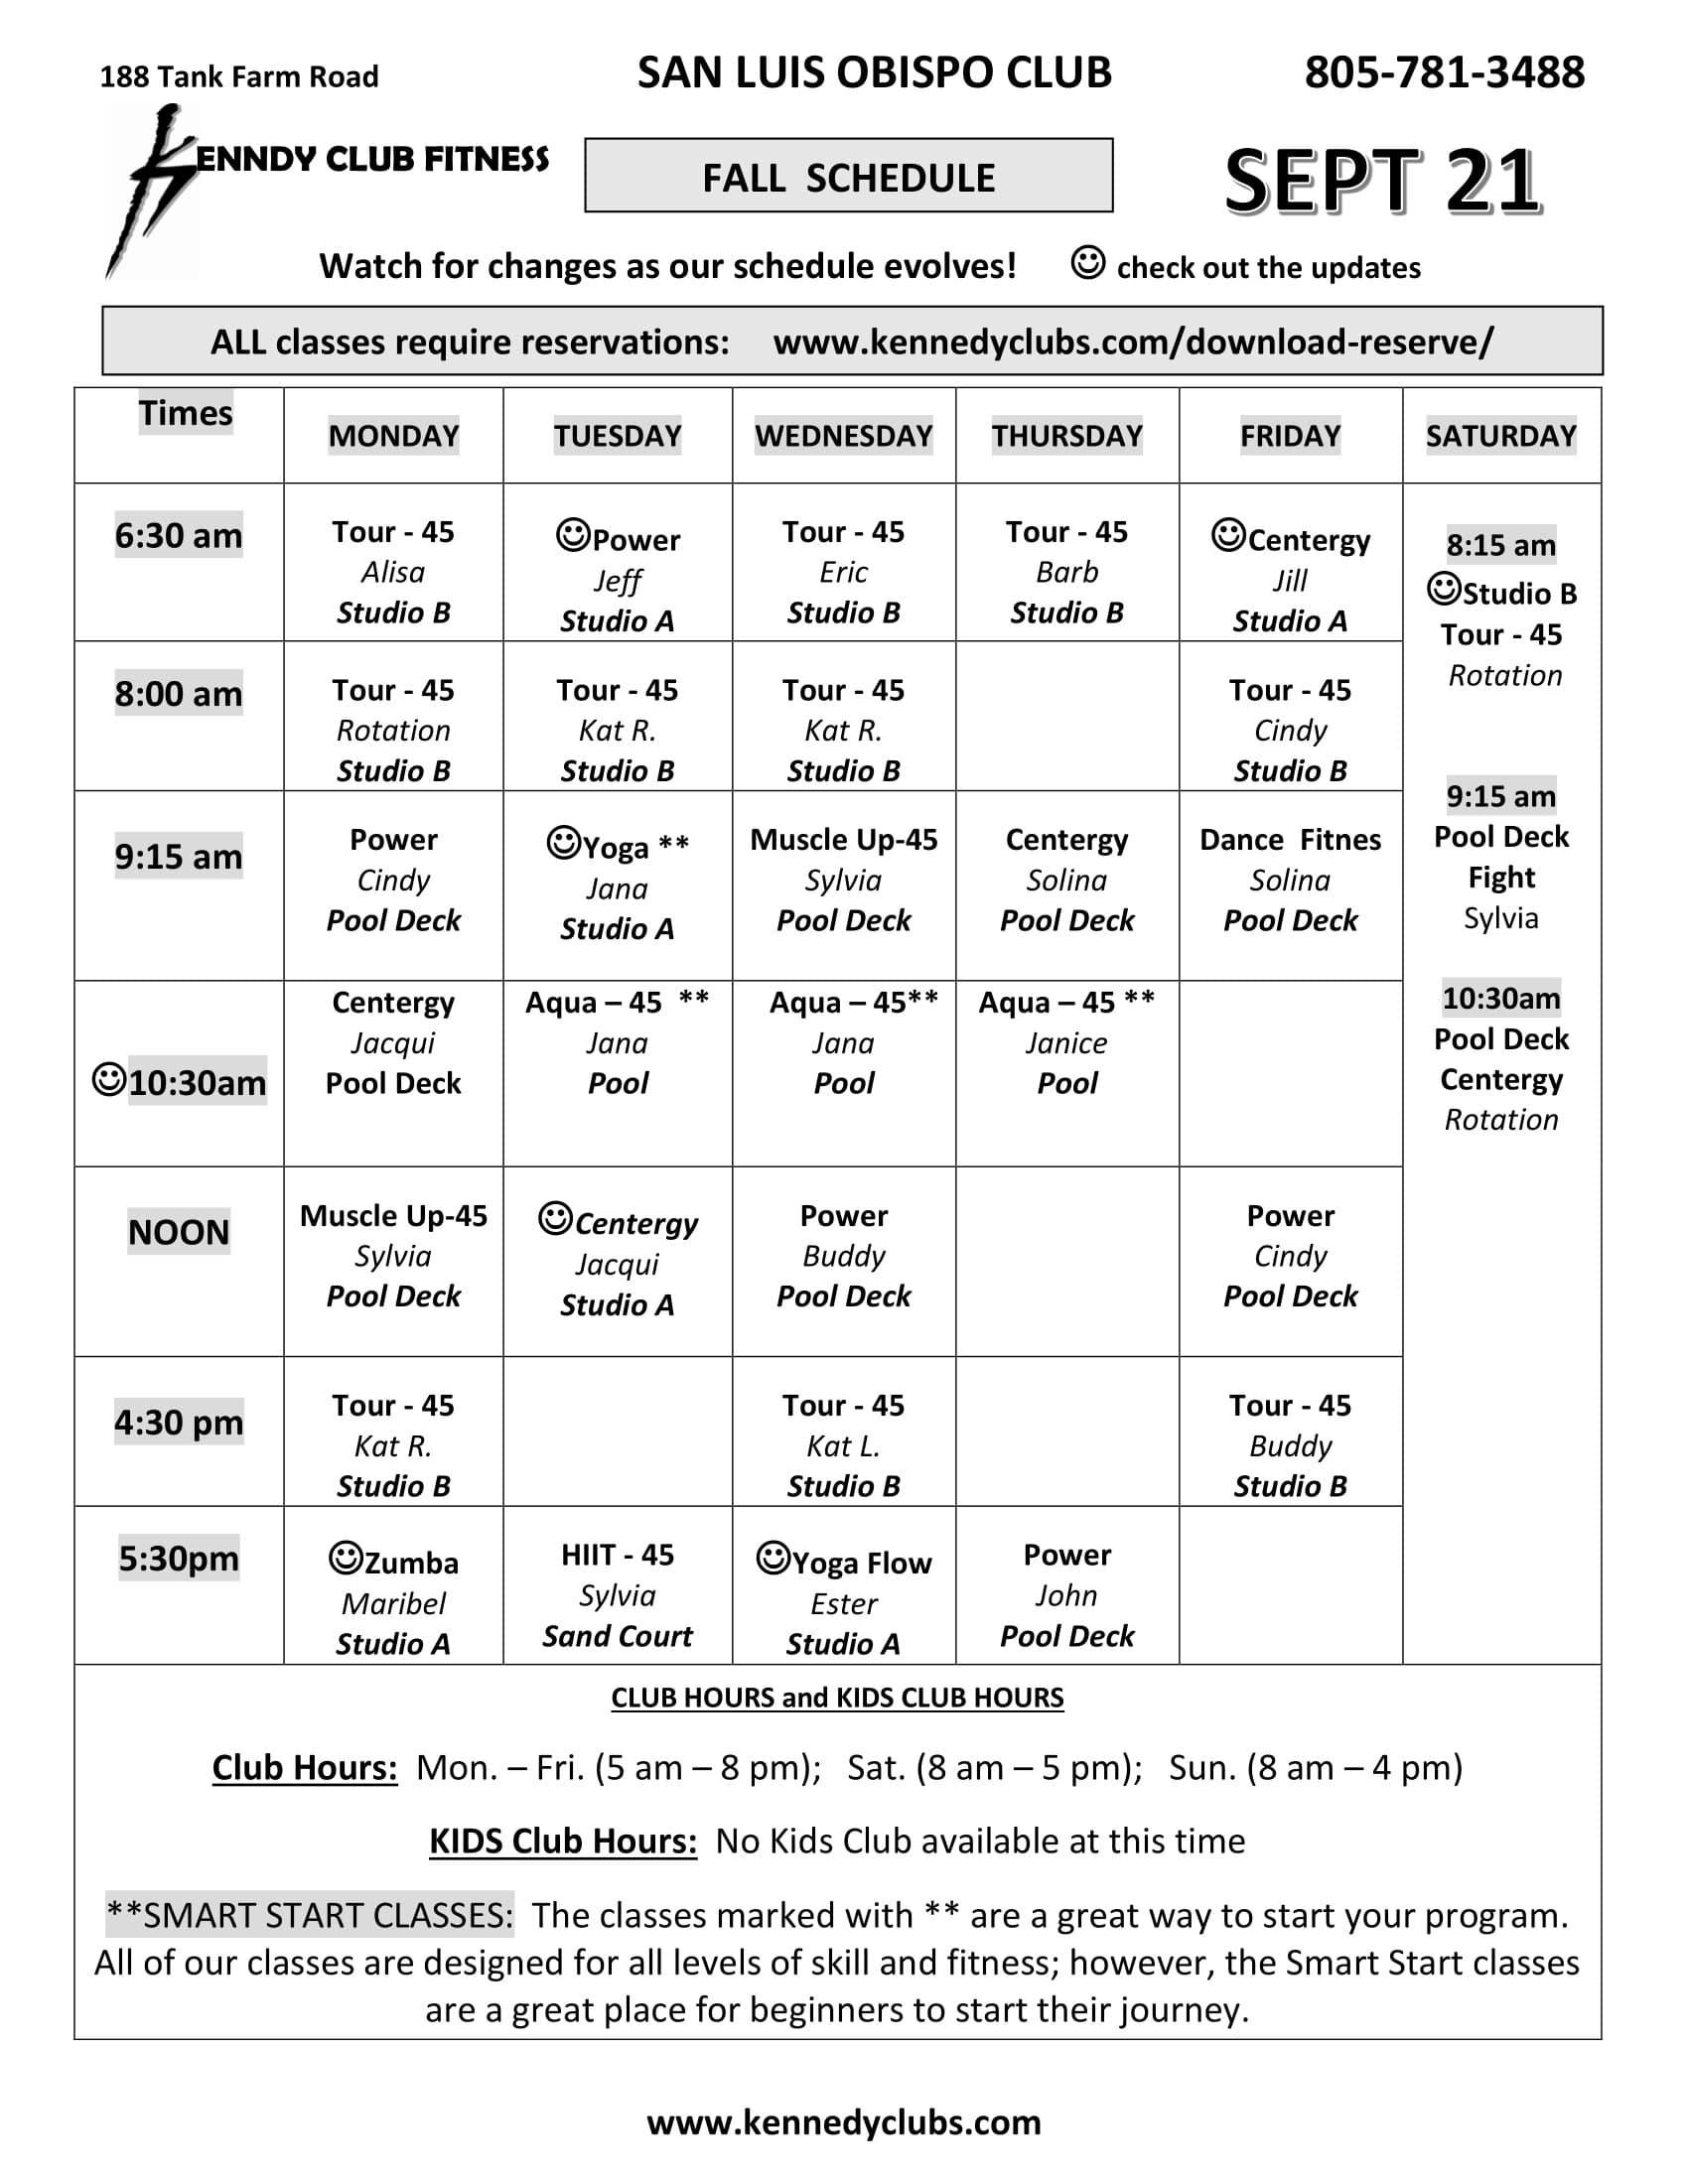 Kennedy Club Fitness San Luis Obispo Group Exercise Schedule 09 21 2020